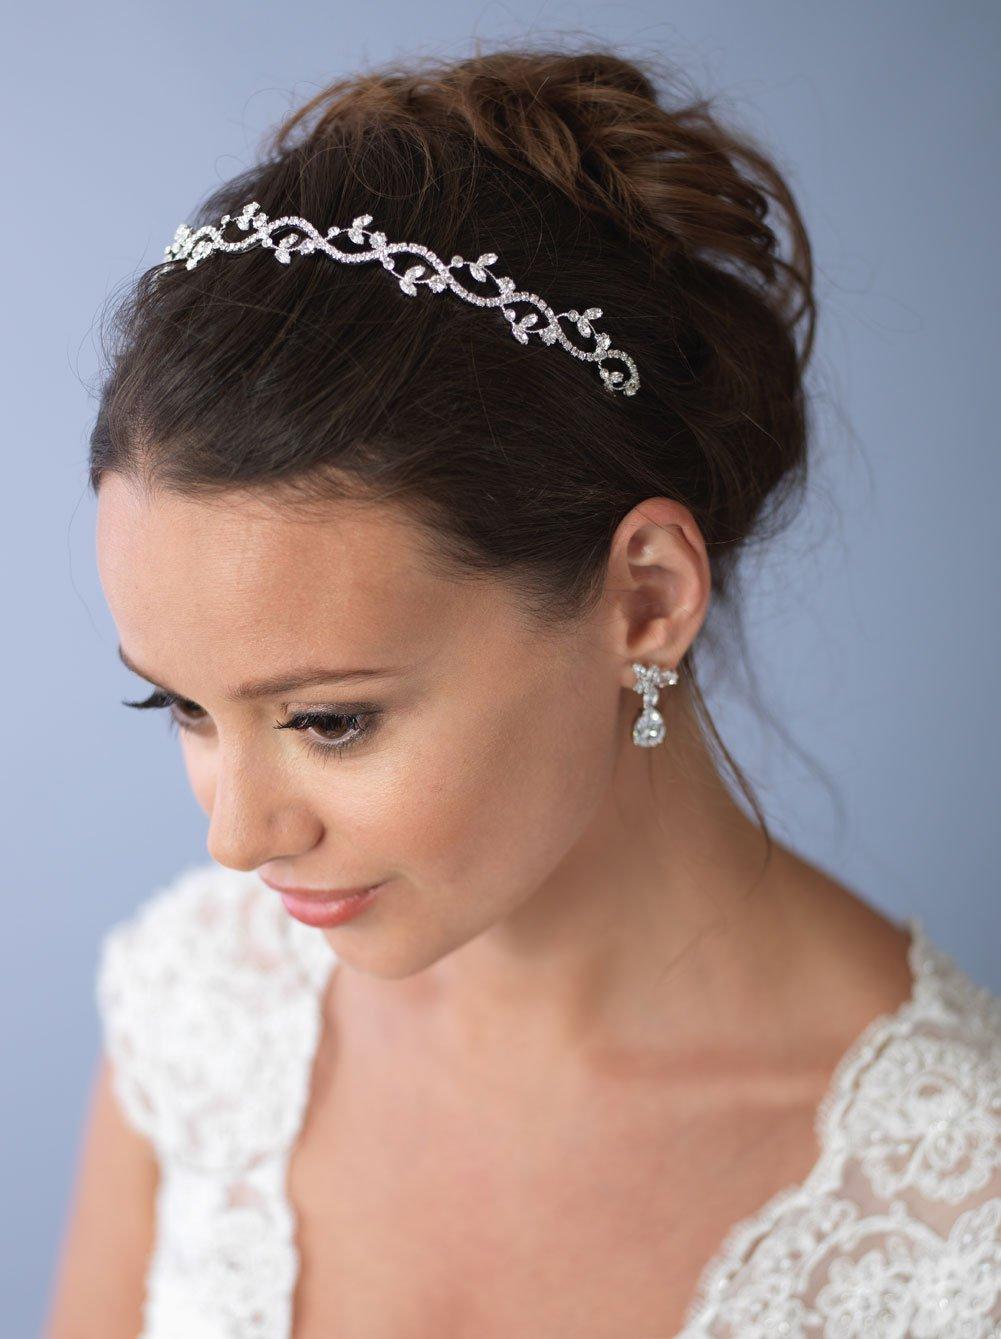 USABride Delicate Wedding Headband Bridal with Floral Rhinestone Hair Accessory 101